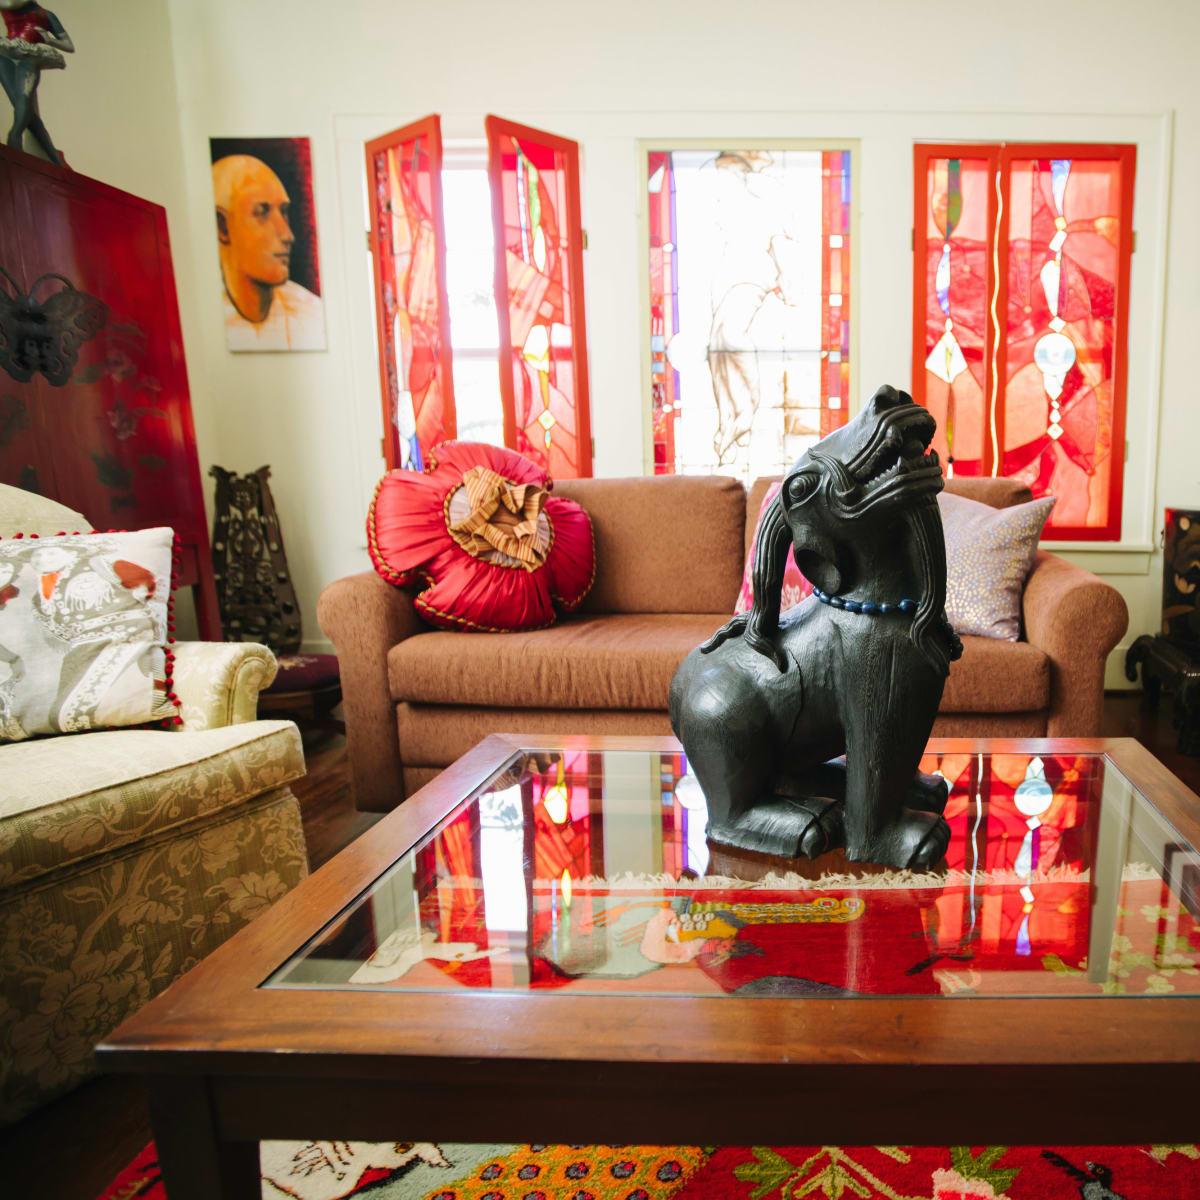 Weird Home Tour Houston The House of Luminosity - Kim Clark Renteria